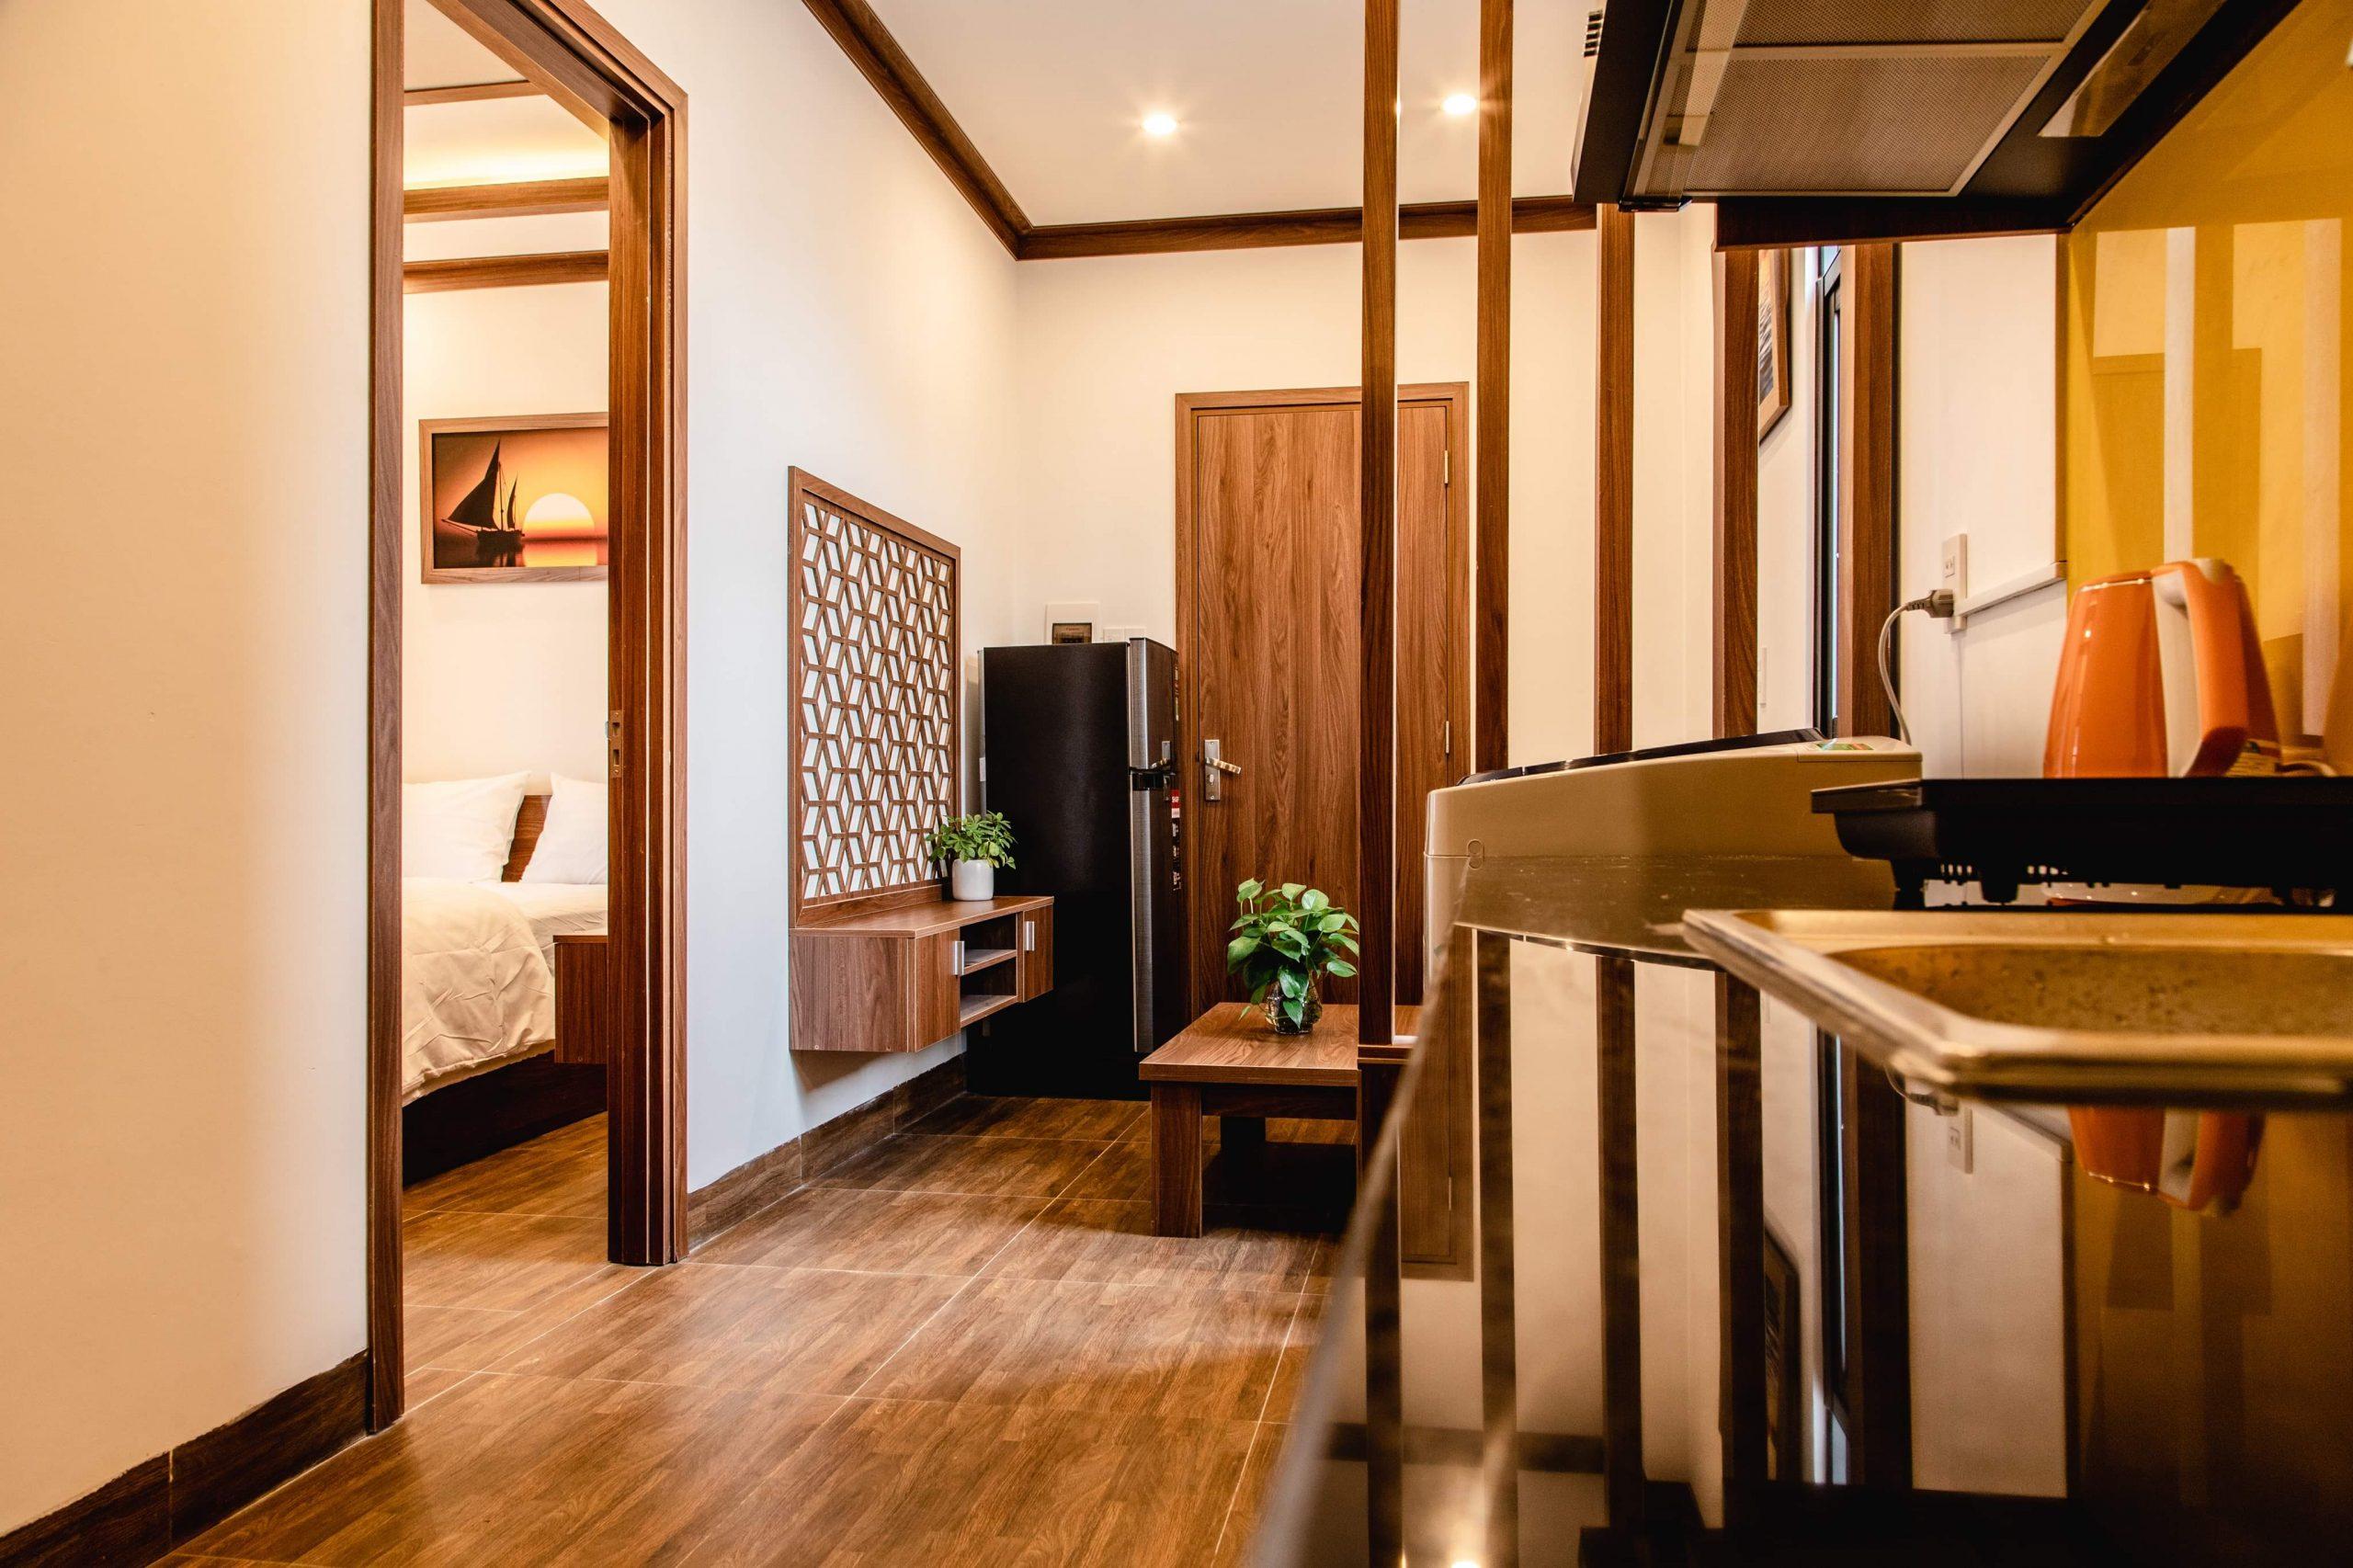 2 bedroom aparment for rent close to My Khe beach Da Nang